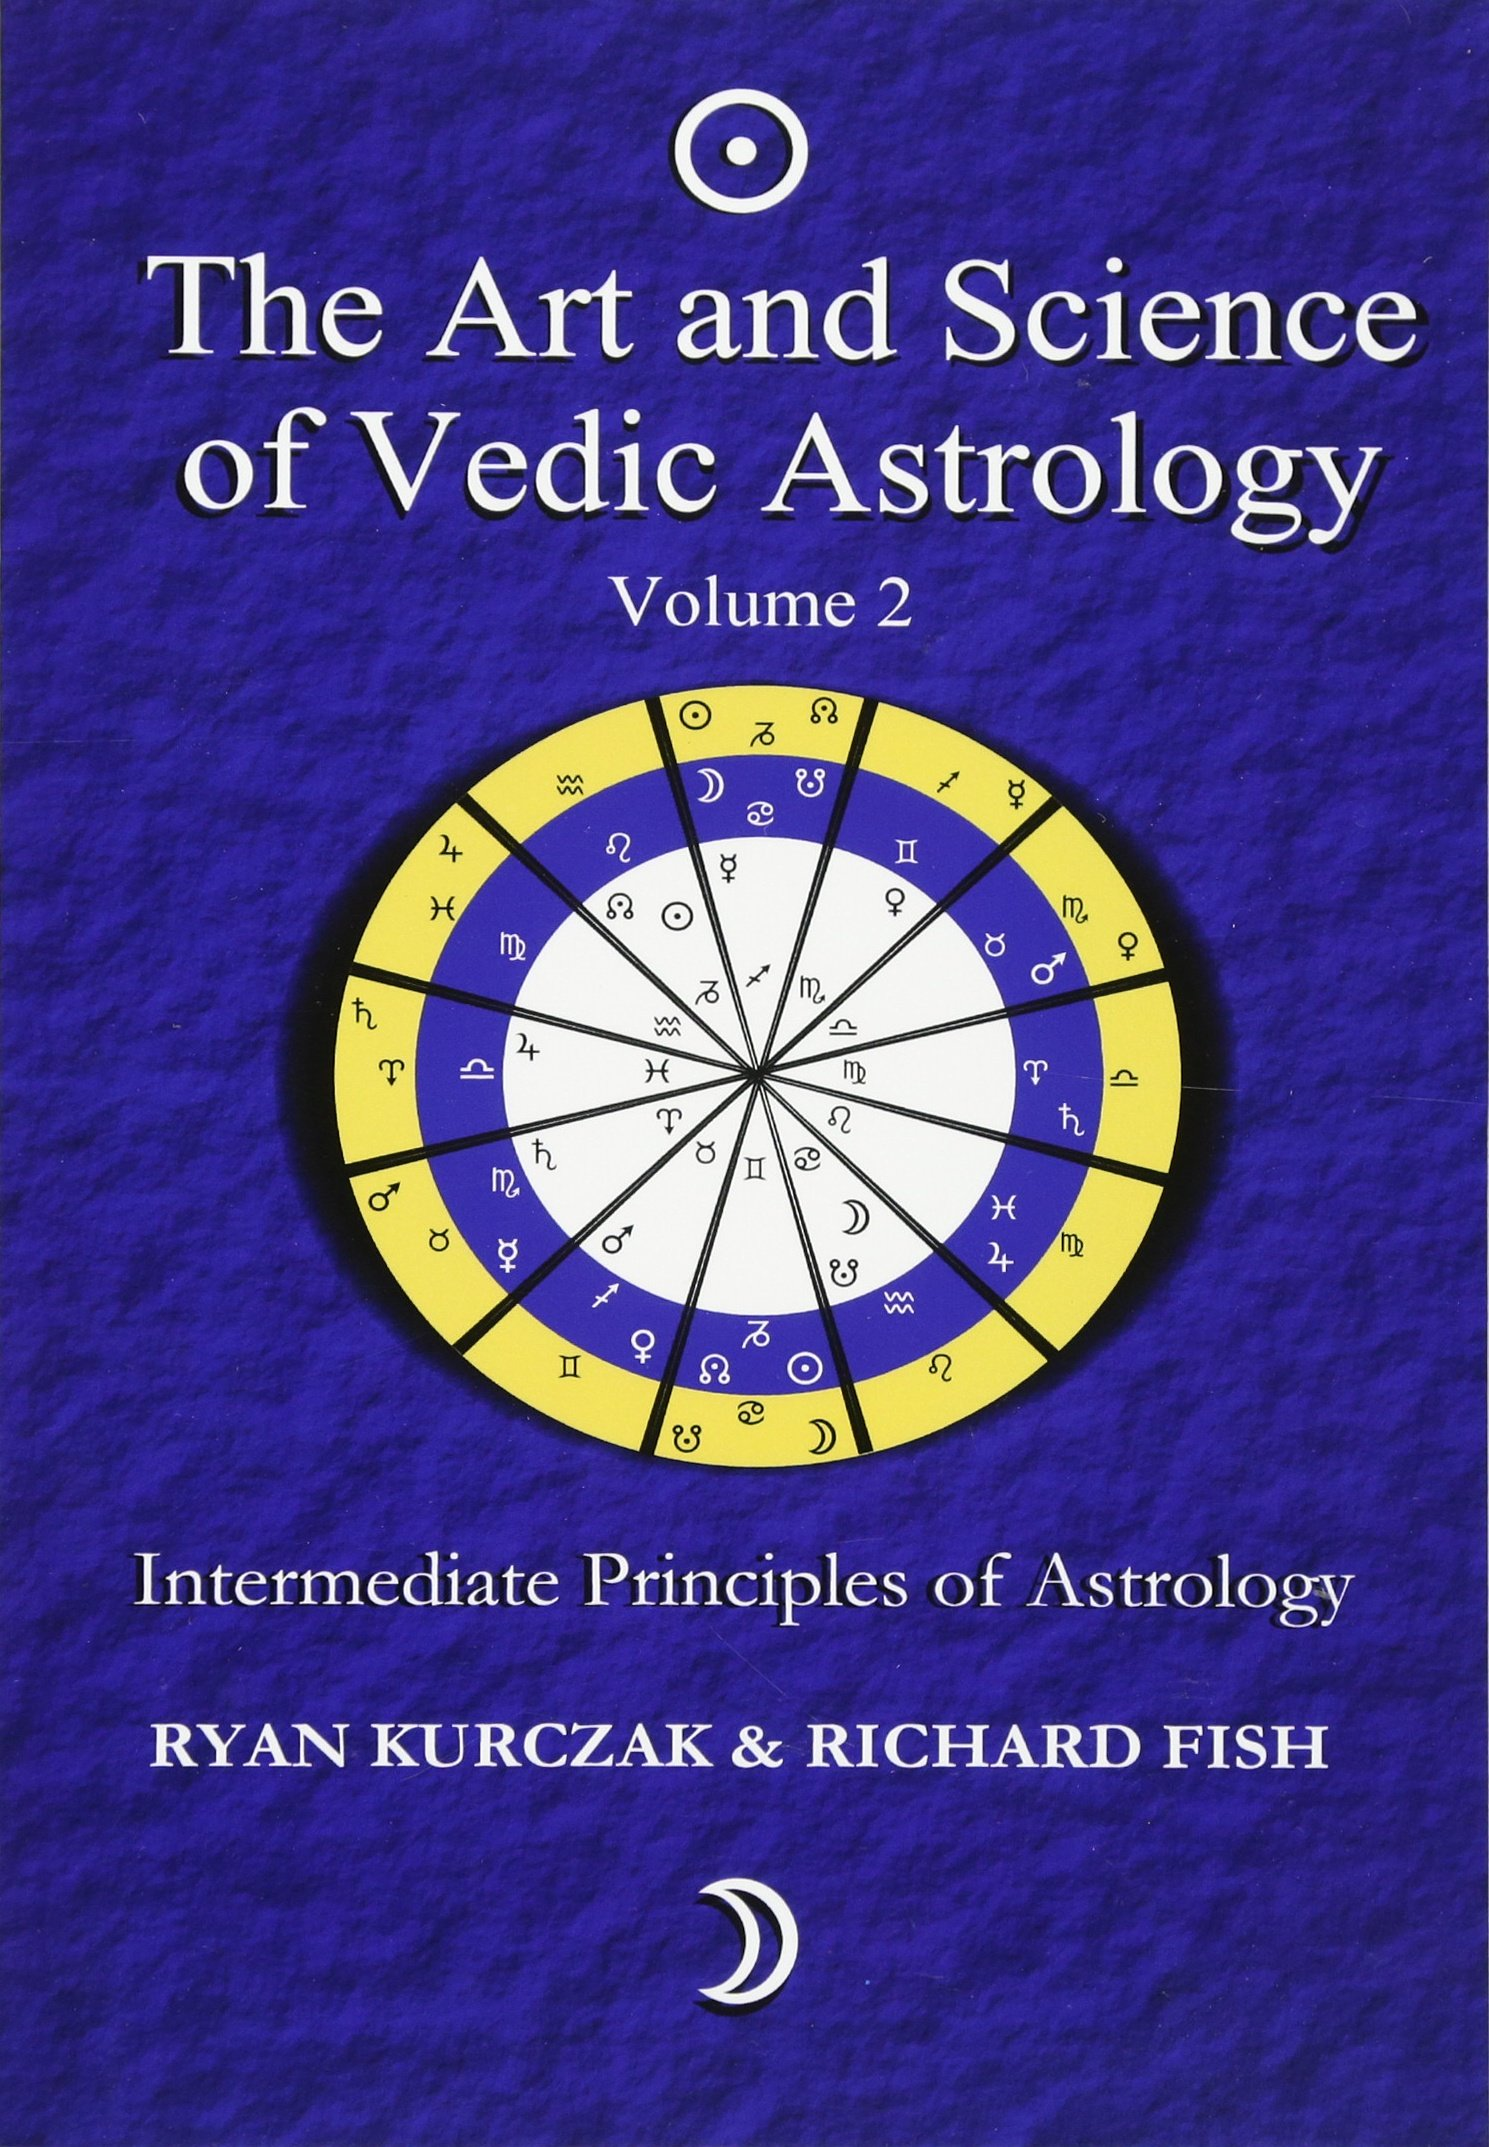 vedic astrology texts